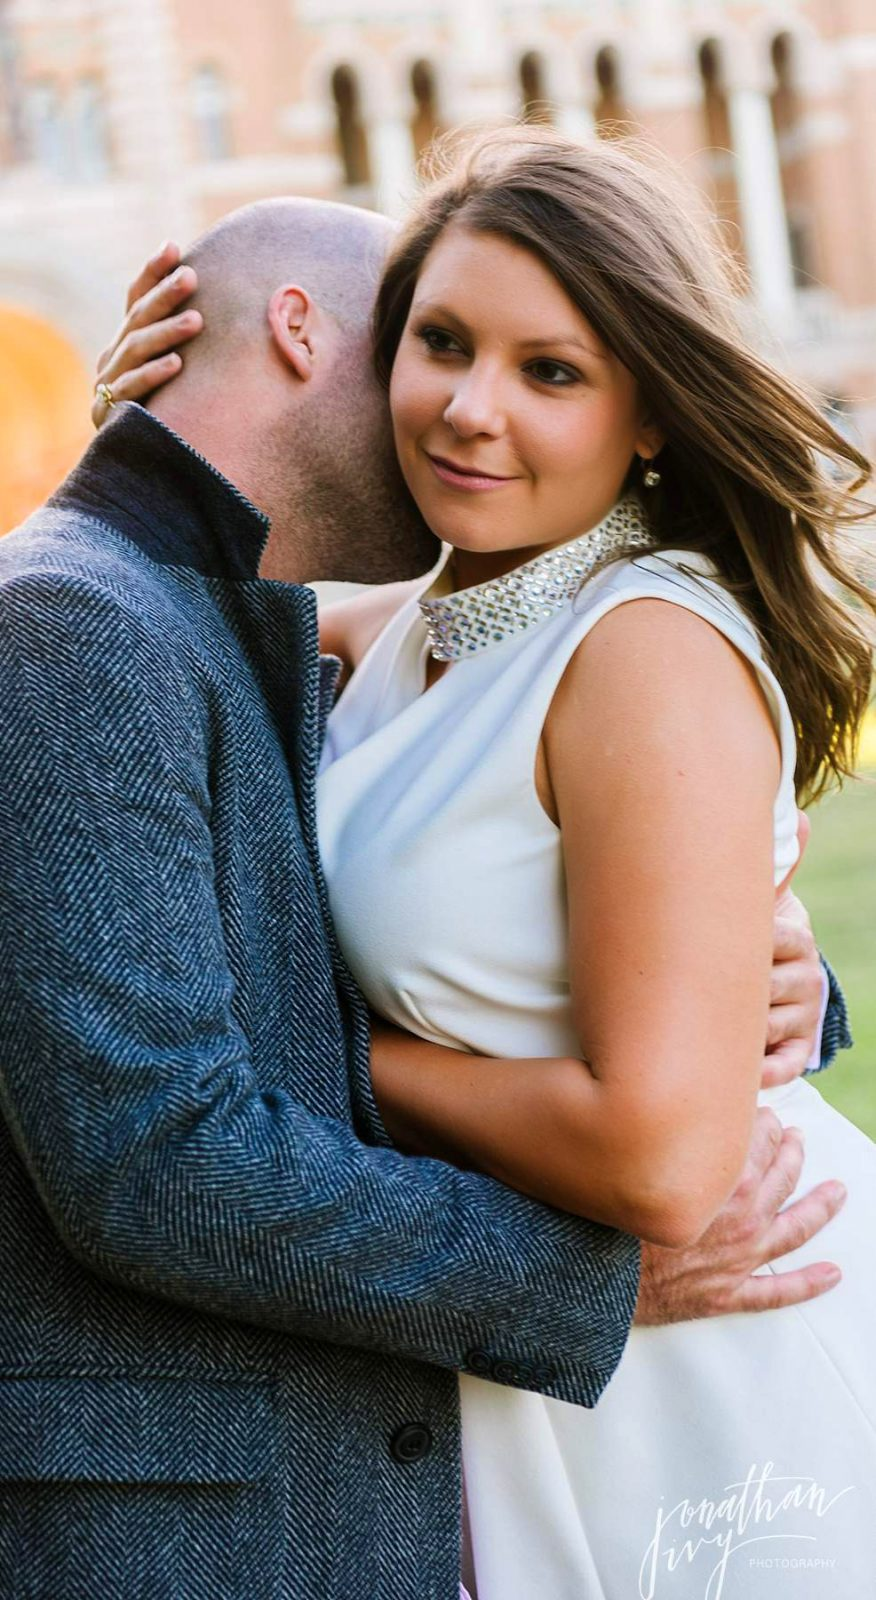 Romantic Couples Pose Ideas